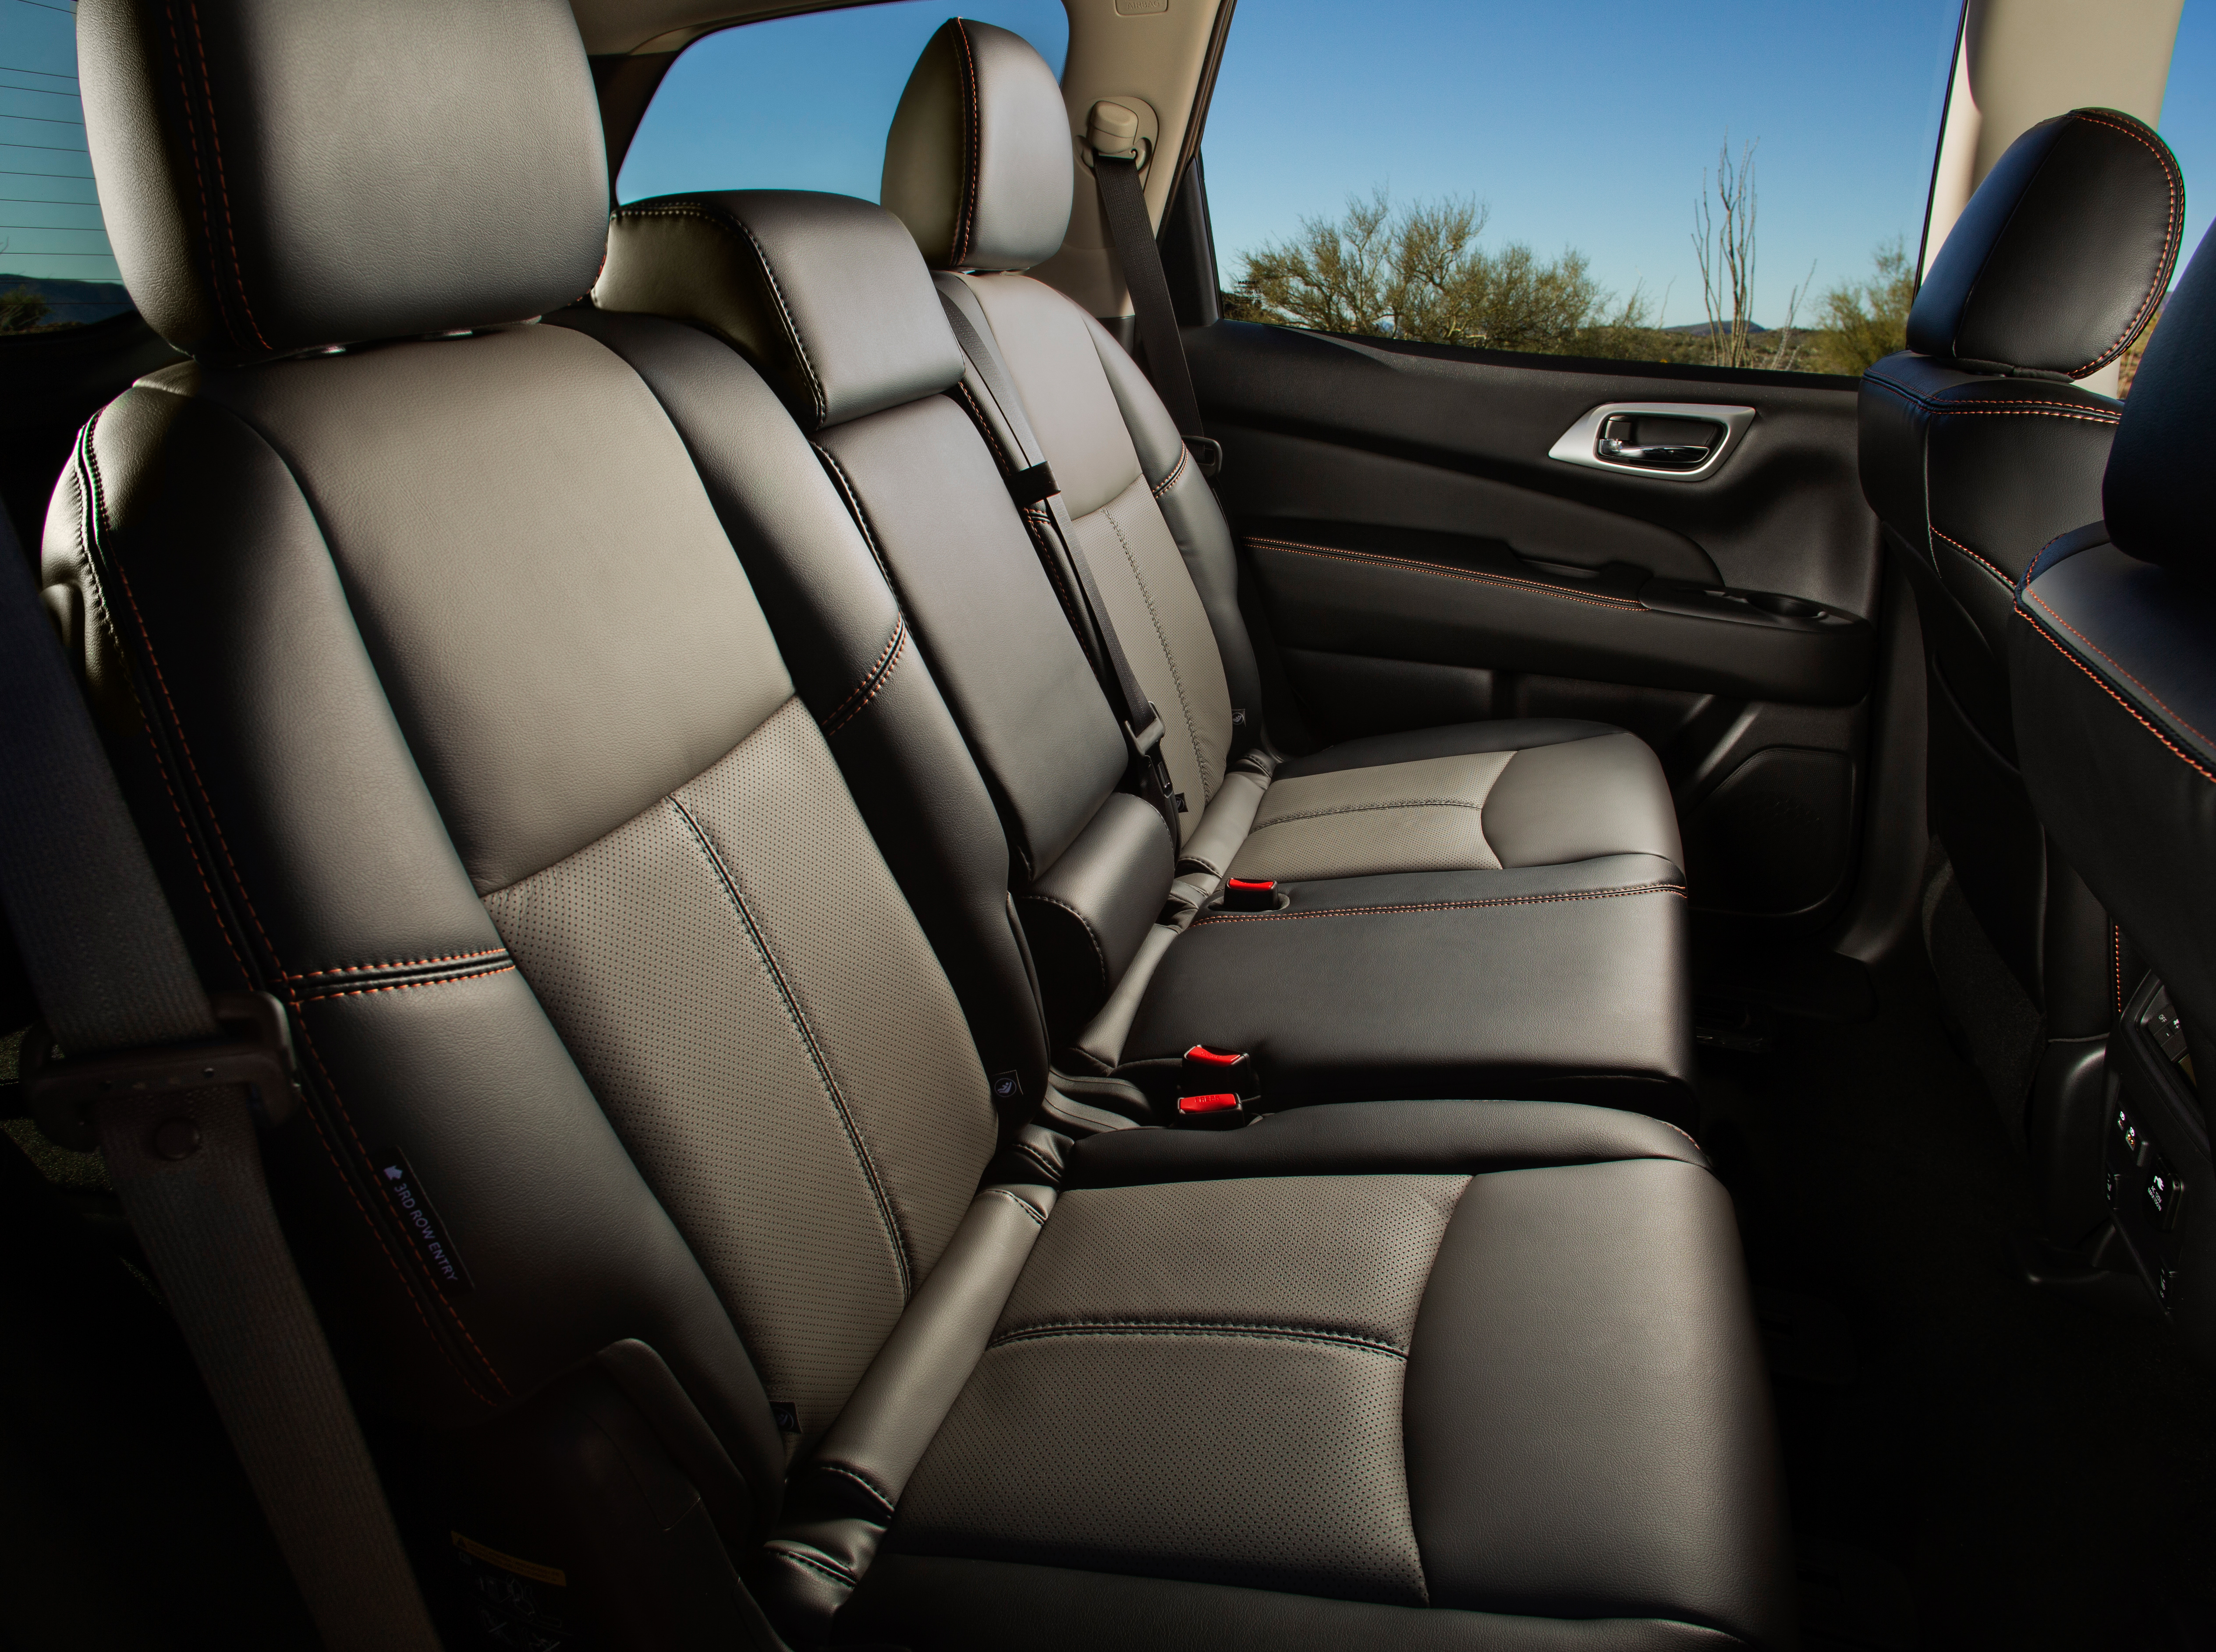 Nissan Pathfinder Rock Creek-12-source